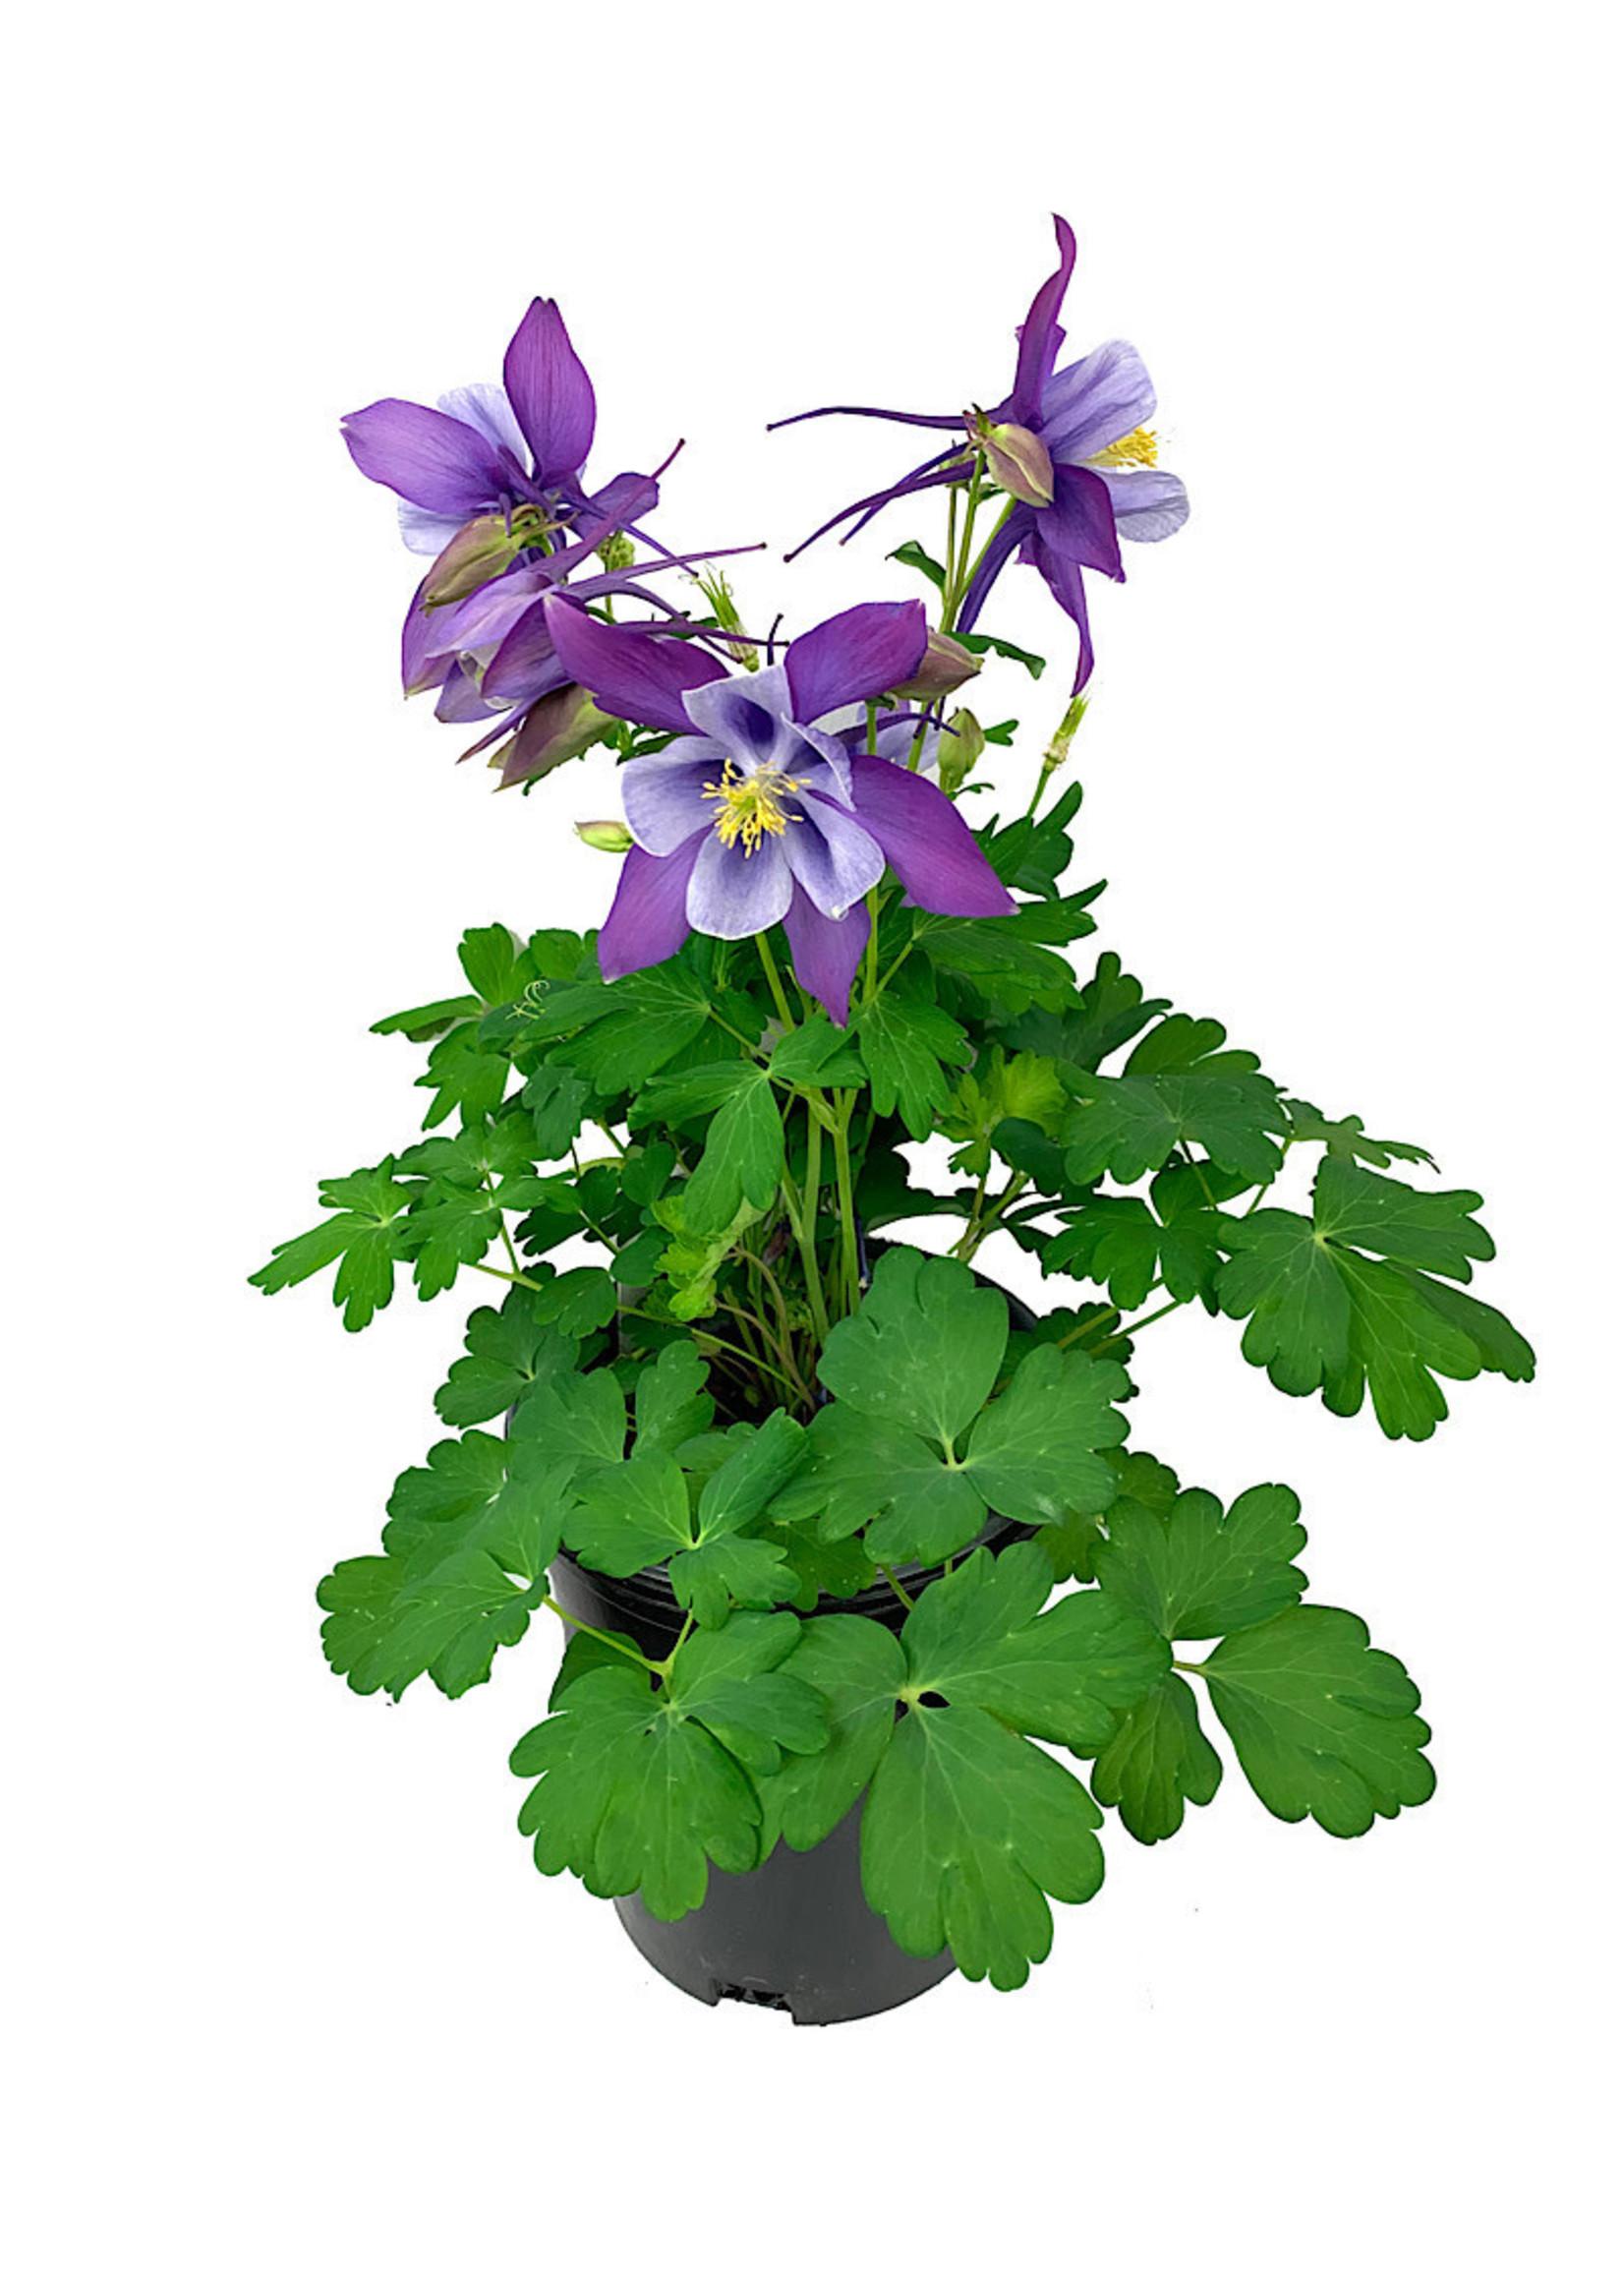 Aquilegia caerulea 'Early Bird Purple/Blue' 1 Gallon